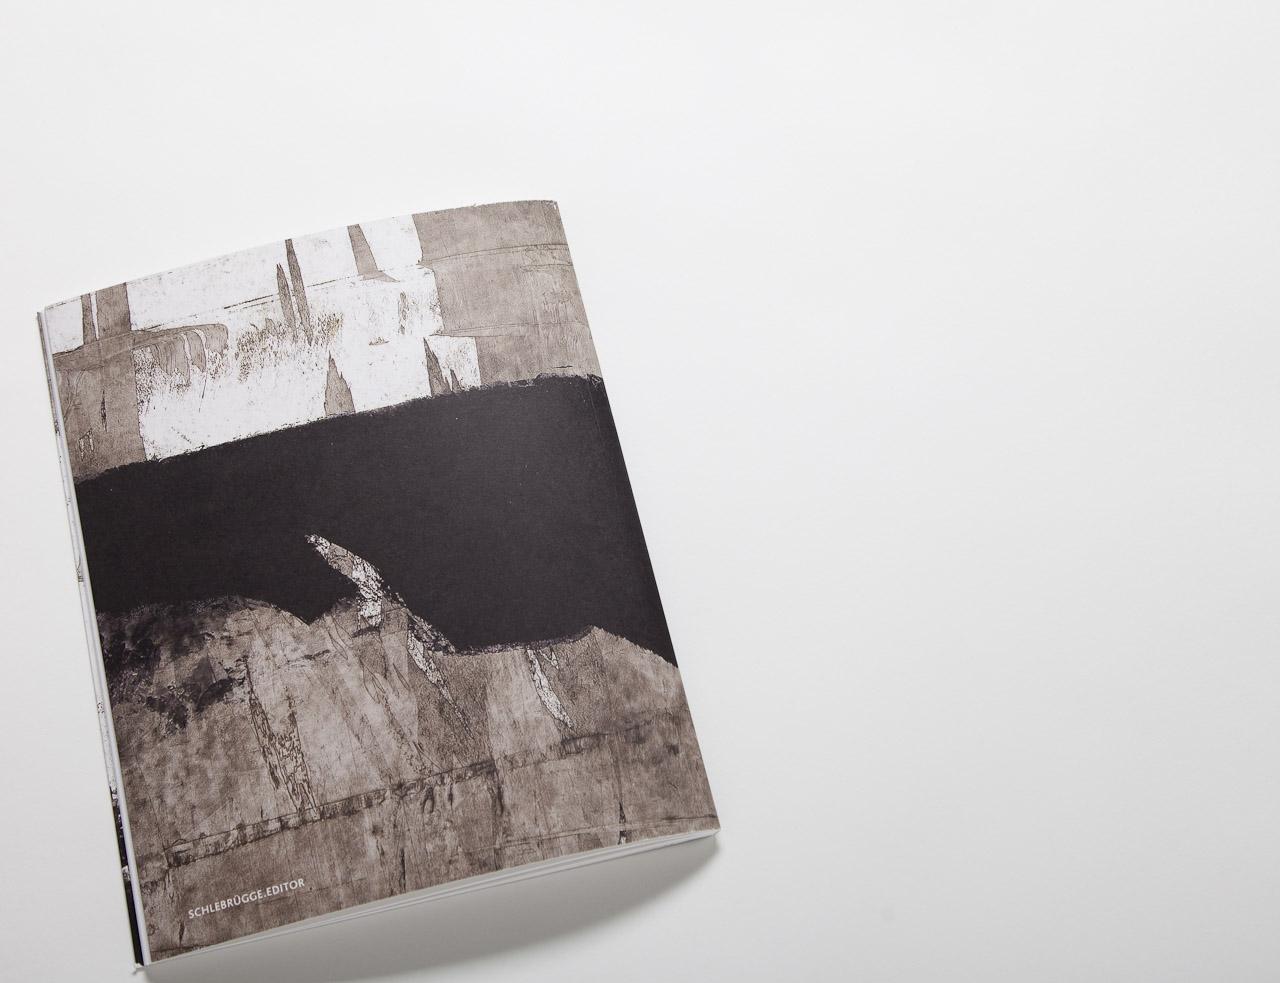 Erwin_Bohatsch_Katalog-8866